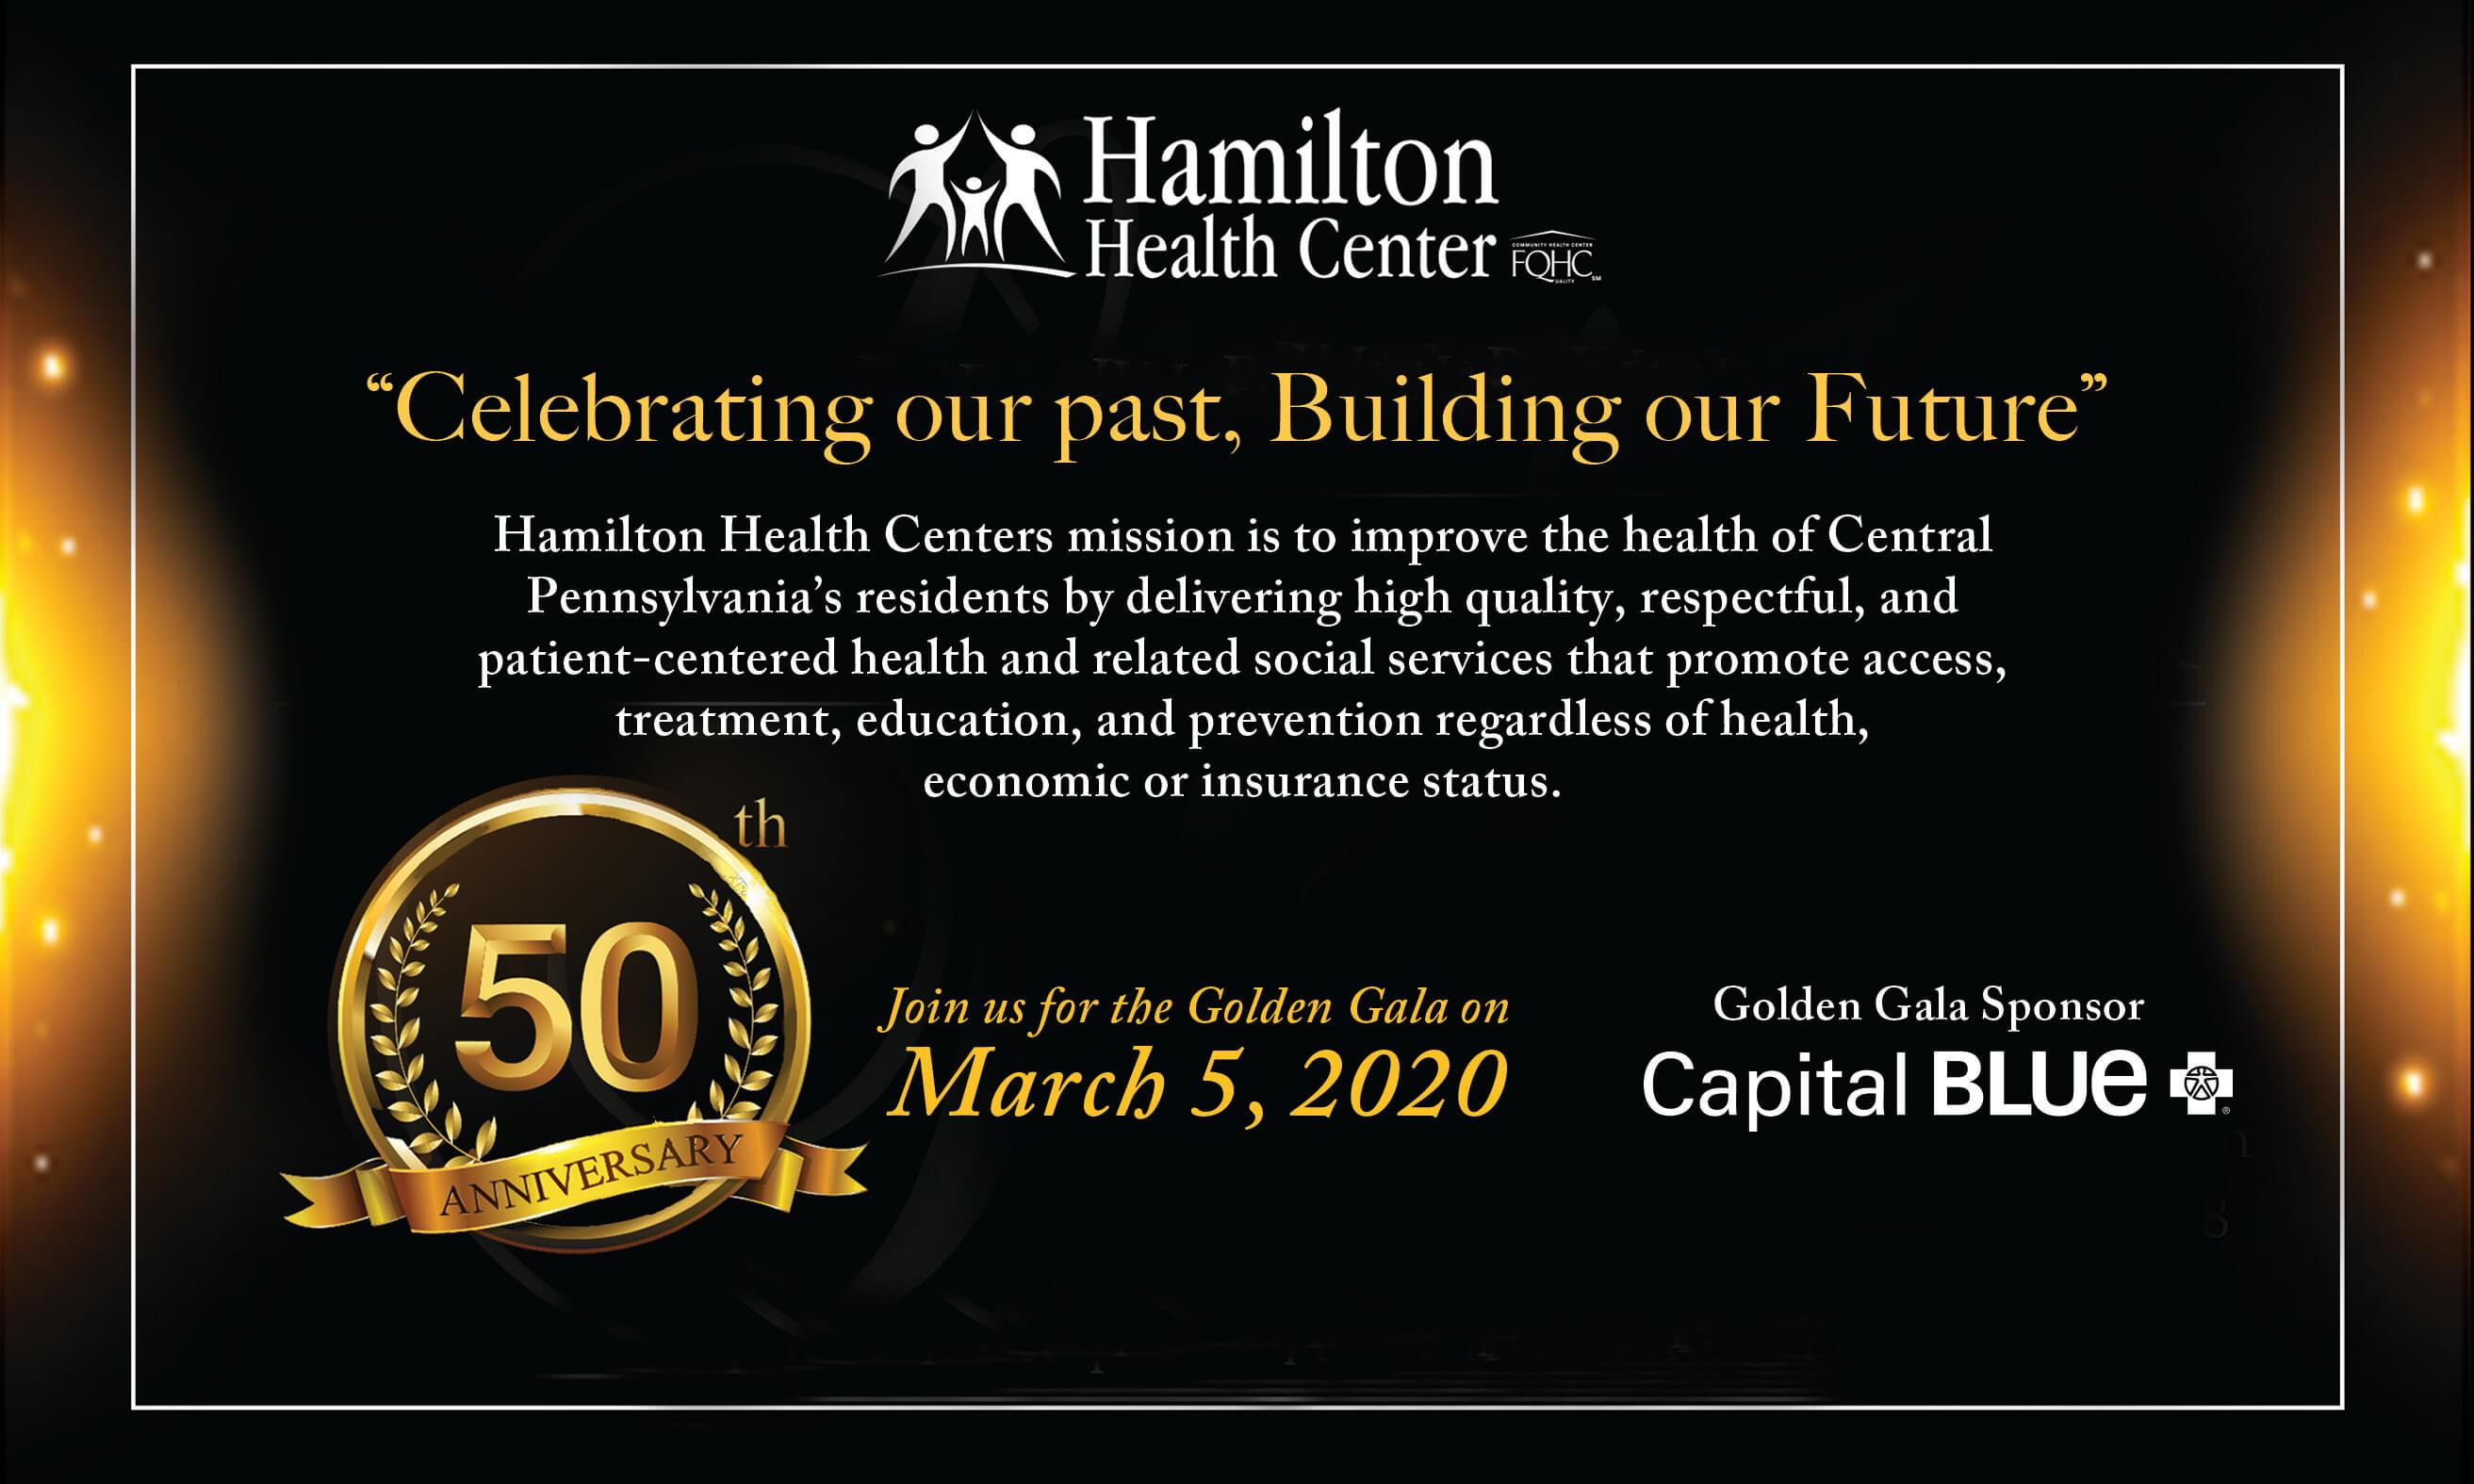 Hamilton Health 50th Anniversary